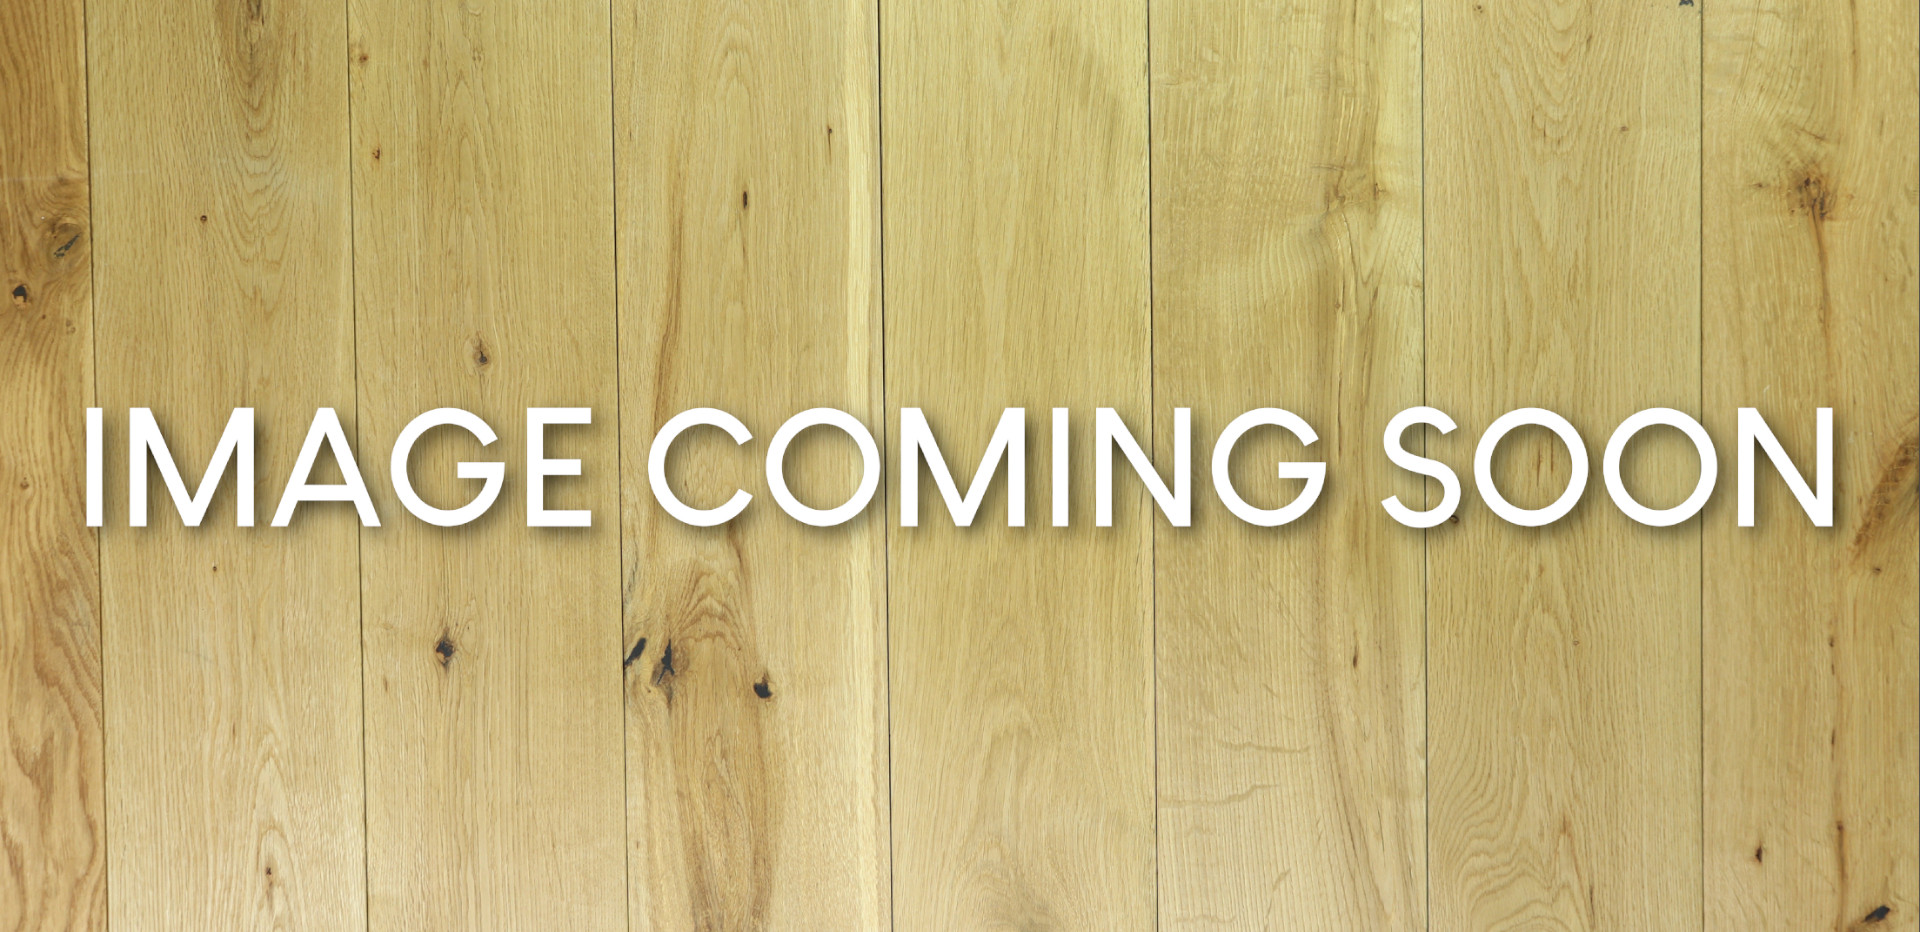 friedman be od overdrive due soon effects coda music. Black Bedroom Furniture Sets. Home Design Ideas